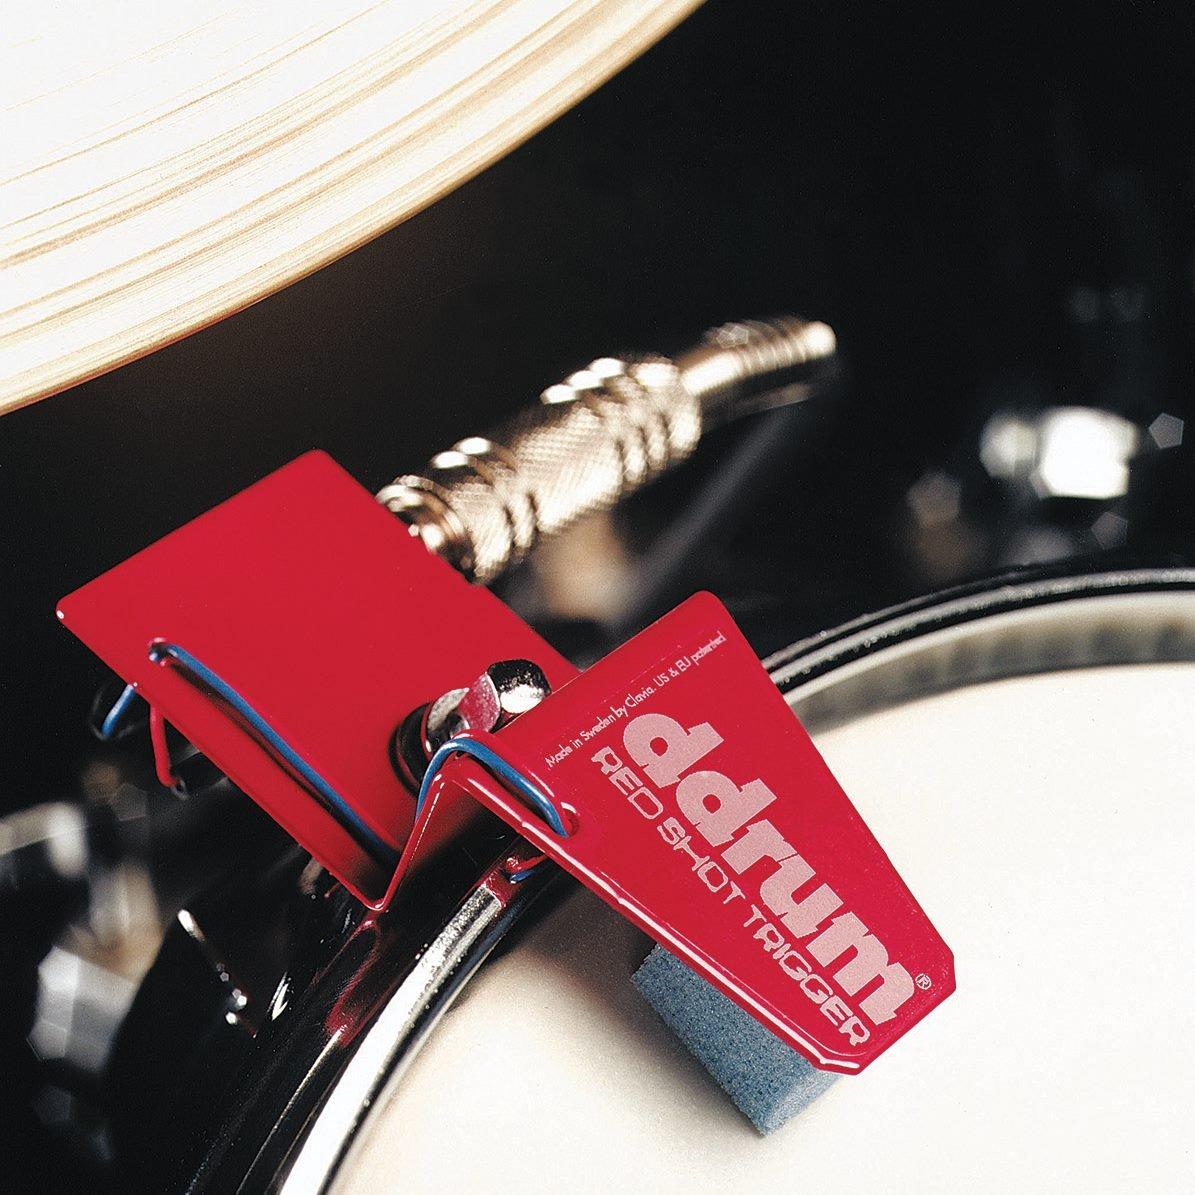 ddrum Red Shot 5 Piece Trigger Kit